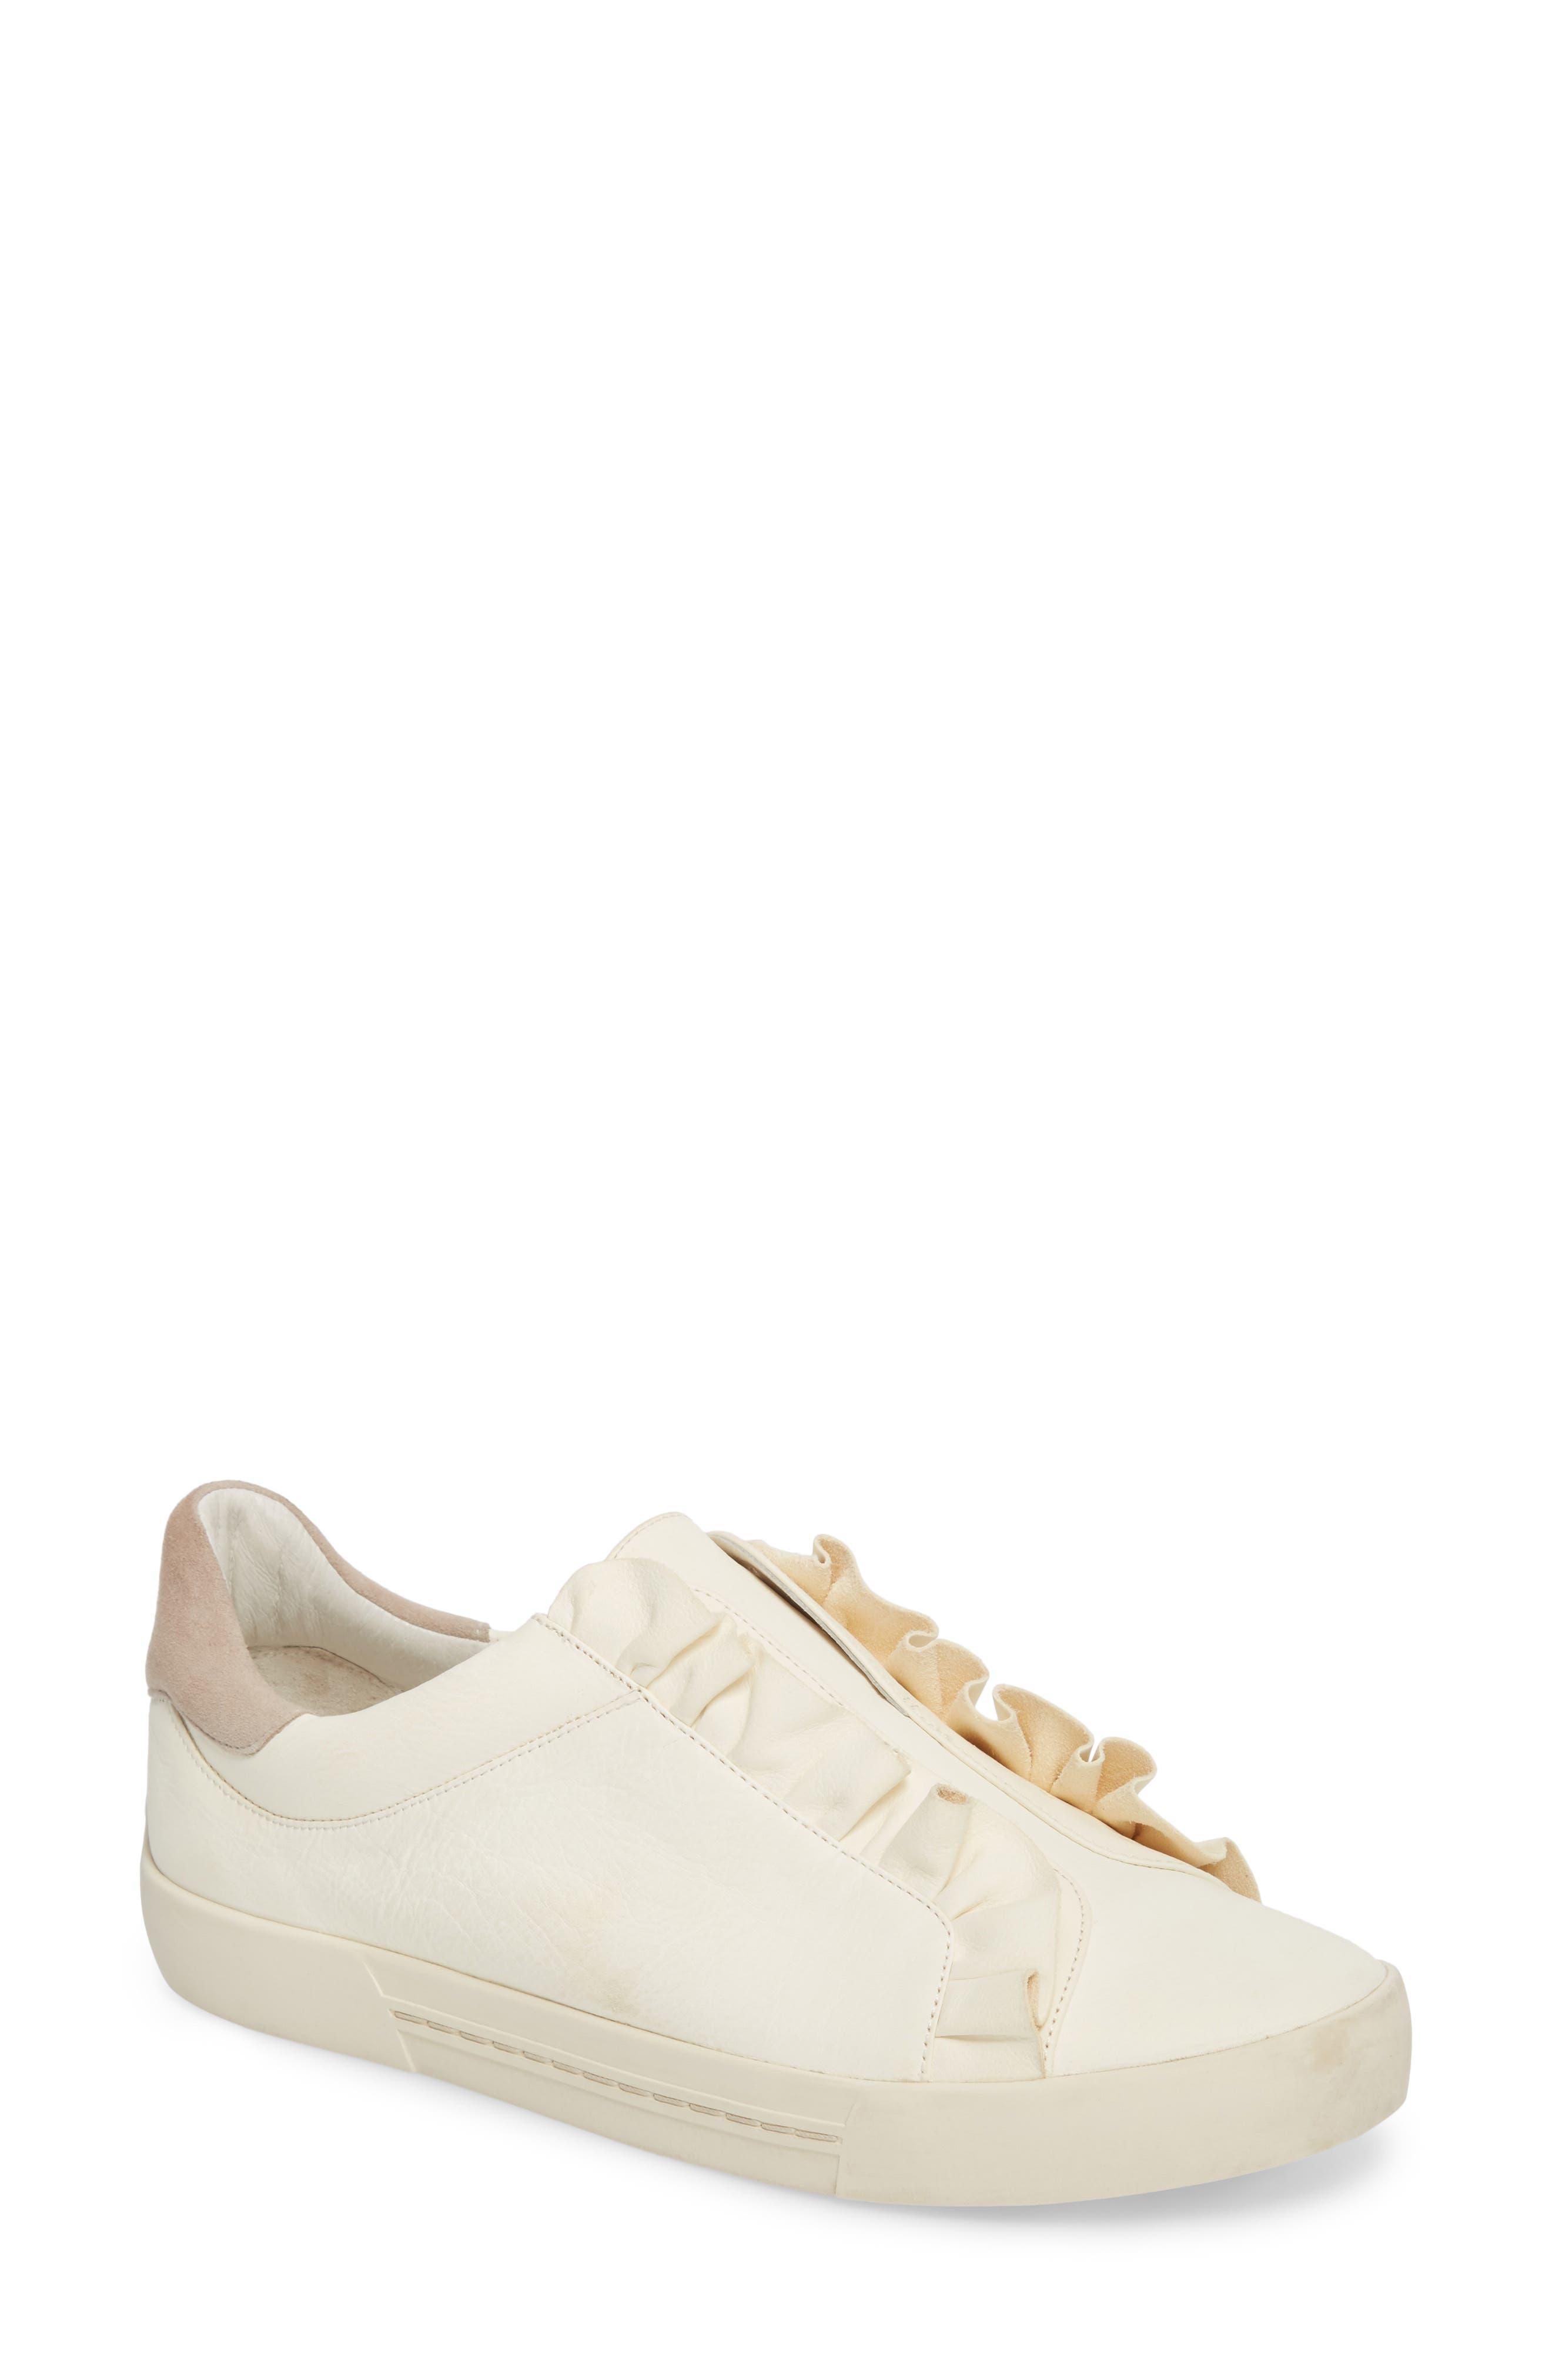 Daw Ruffle Slip-On Sneaker,                             Main thumbnail 1, color,                             900